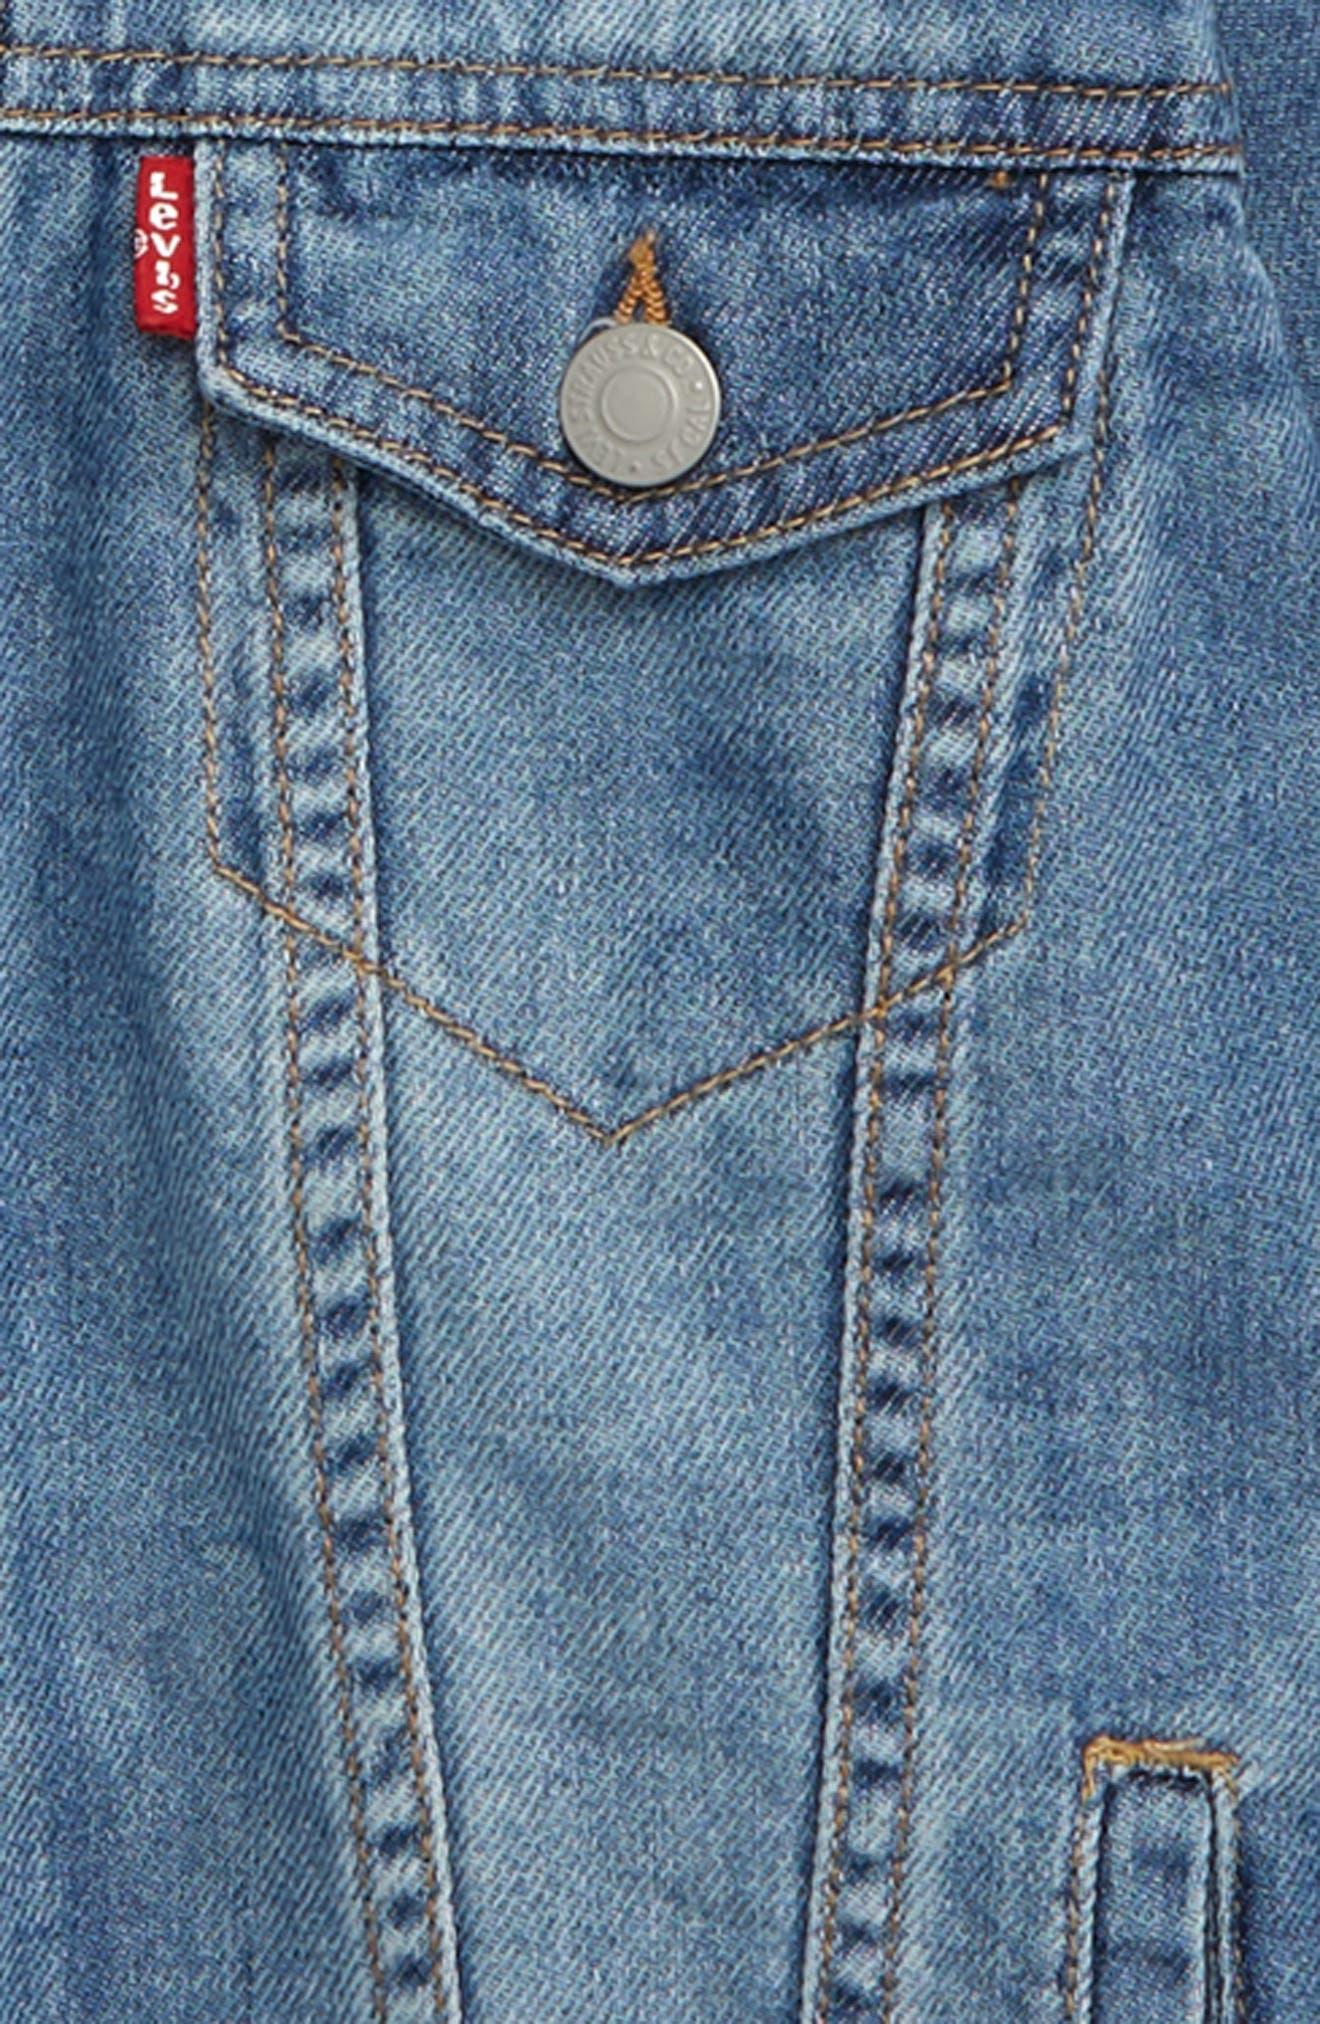 Boys LeviS Lightweight Denim Jacket Size XL (16)  Blue